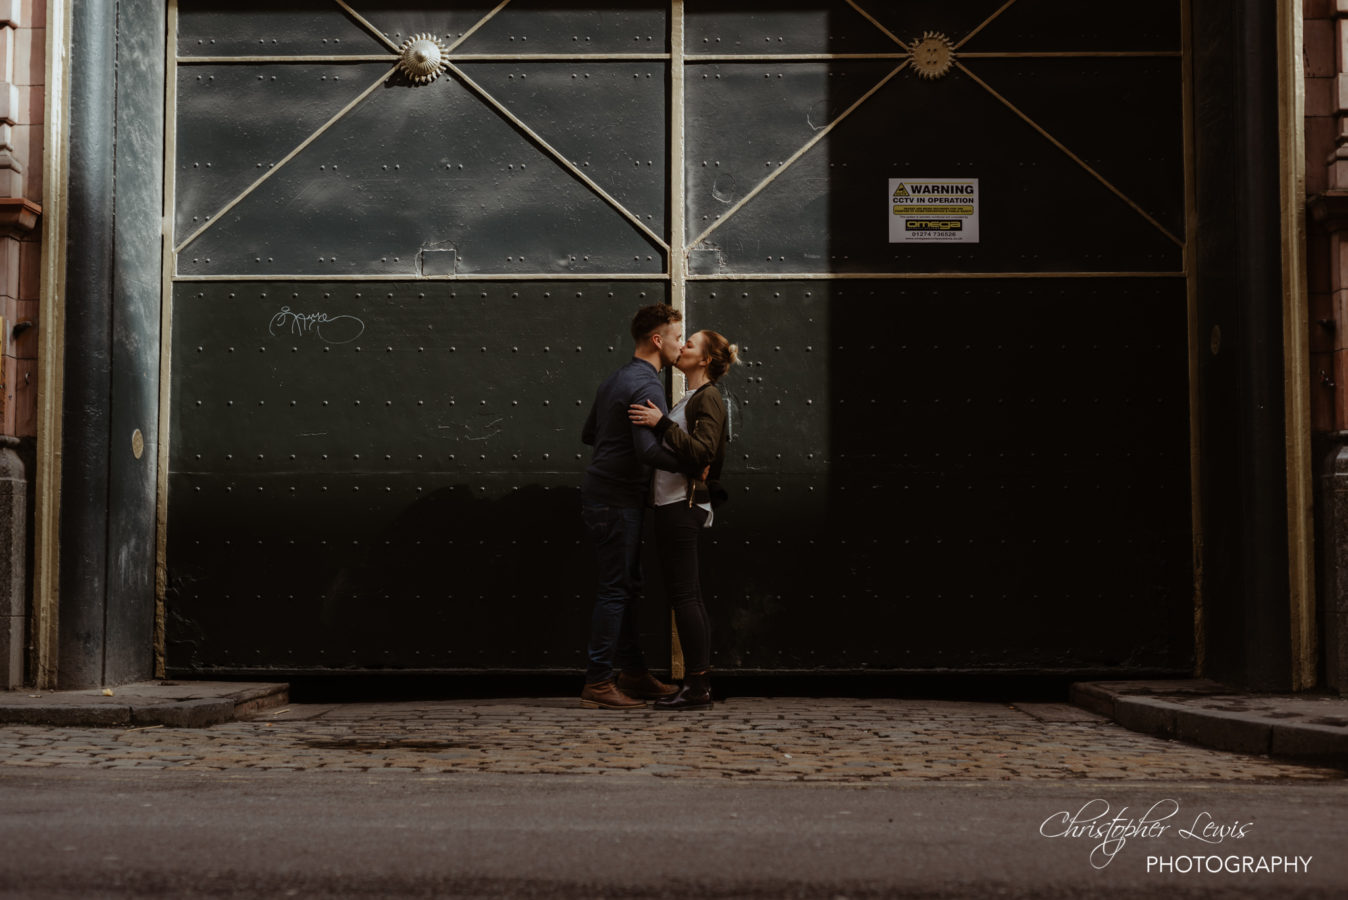 Northern-Quarter-Manchester-Pre-Wedding-Photoshoot-7